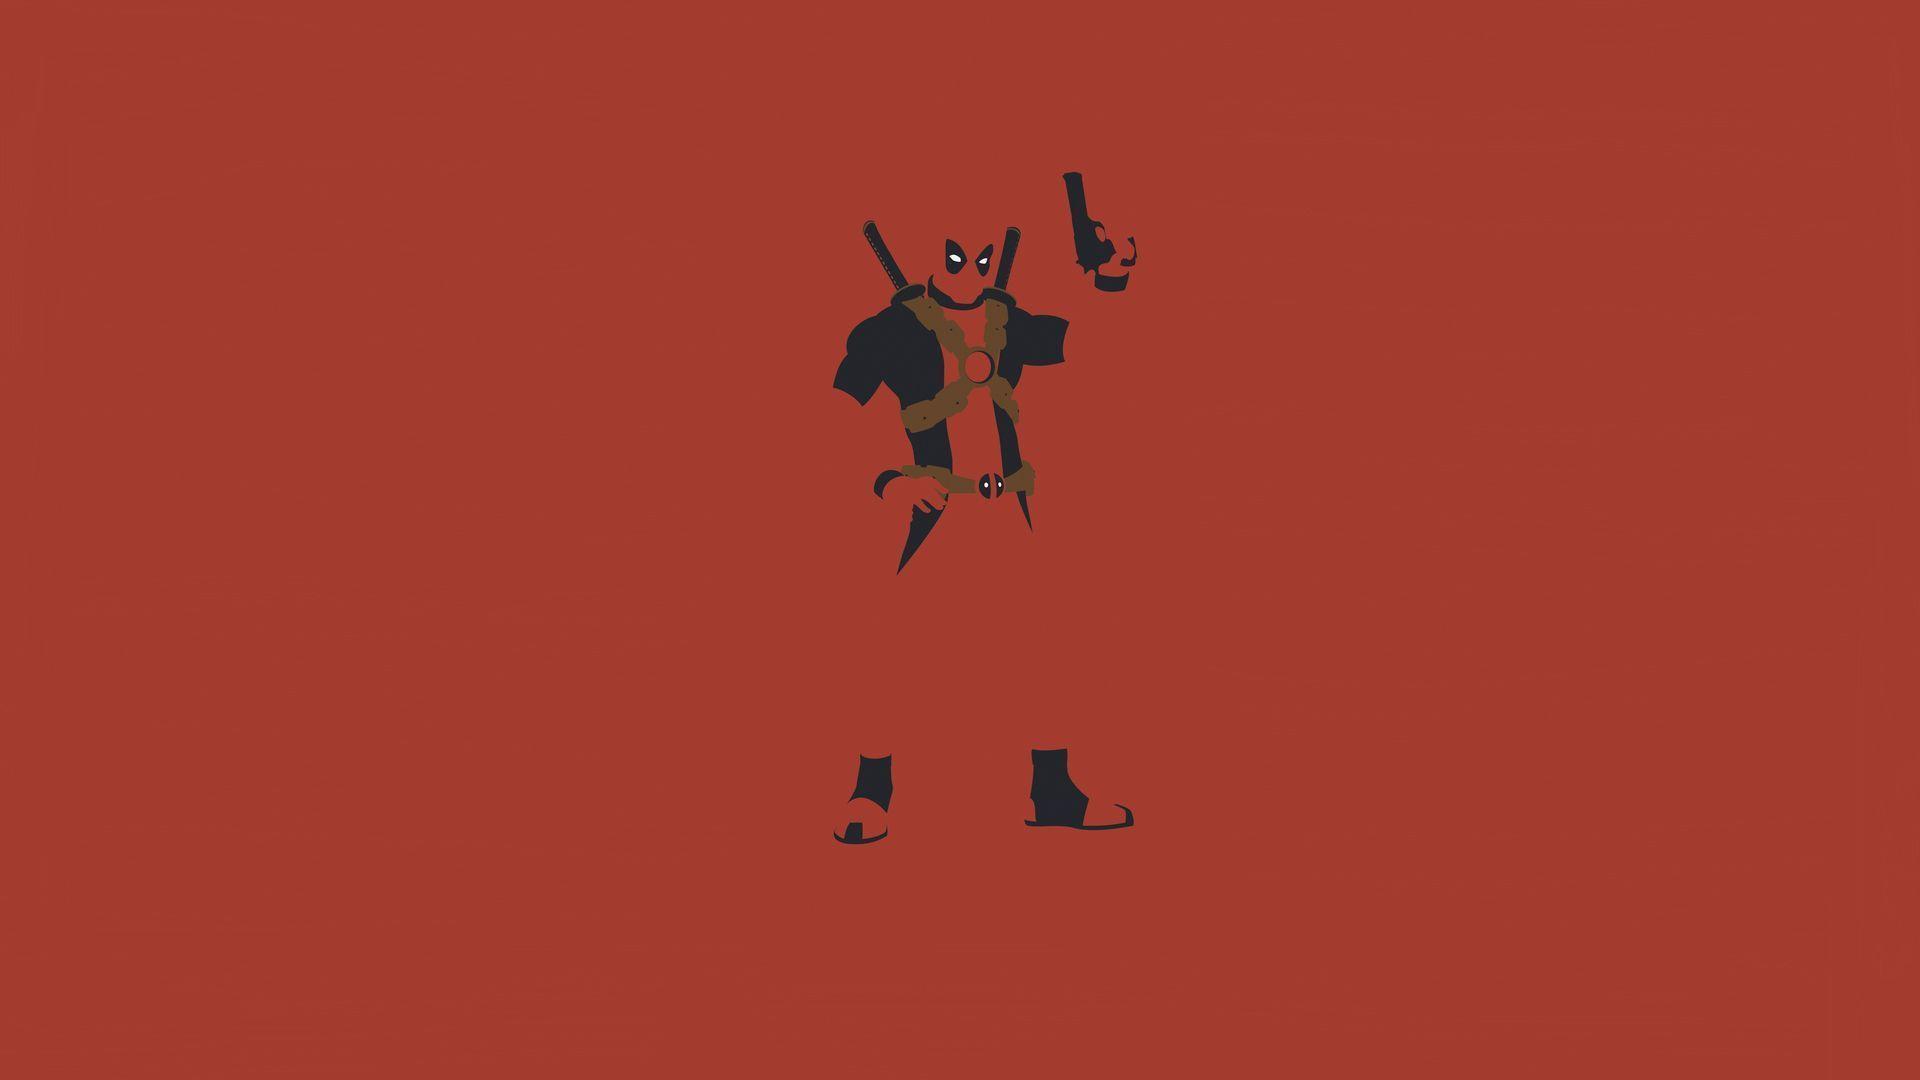 Deadpool HD Wallpaper 1920x1080